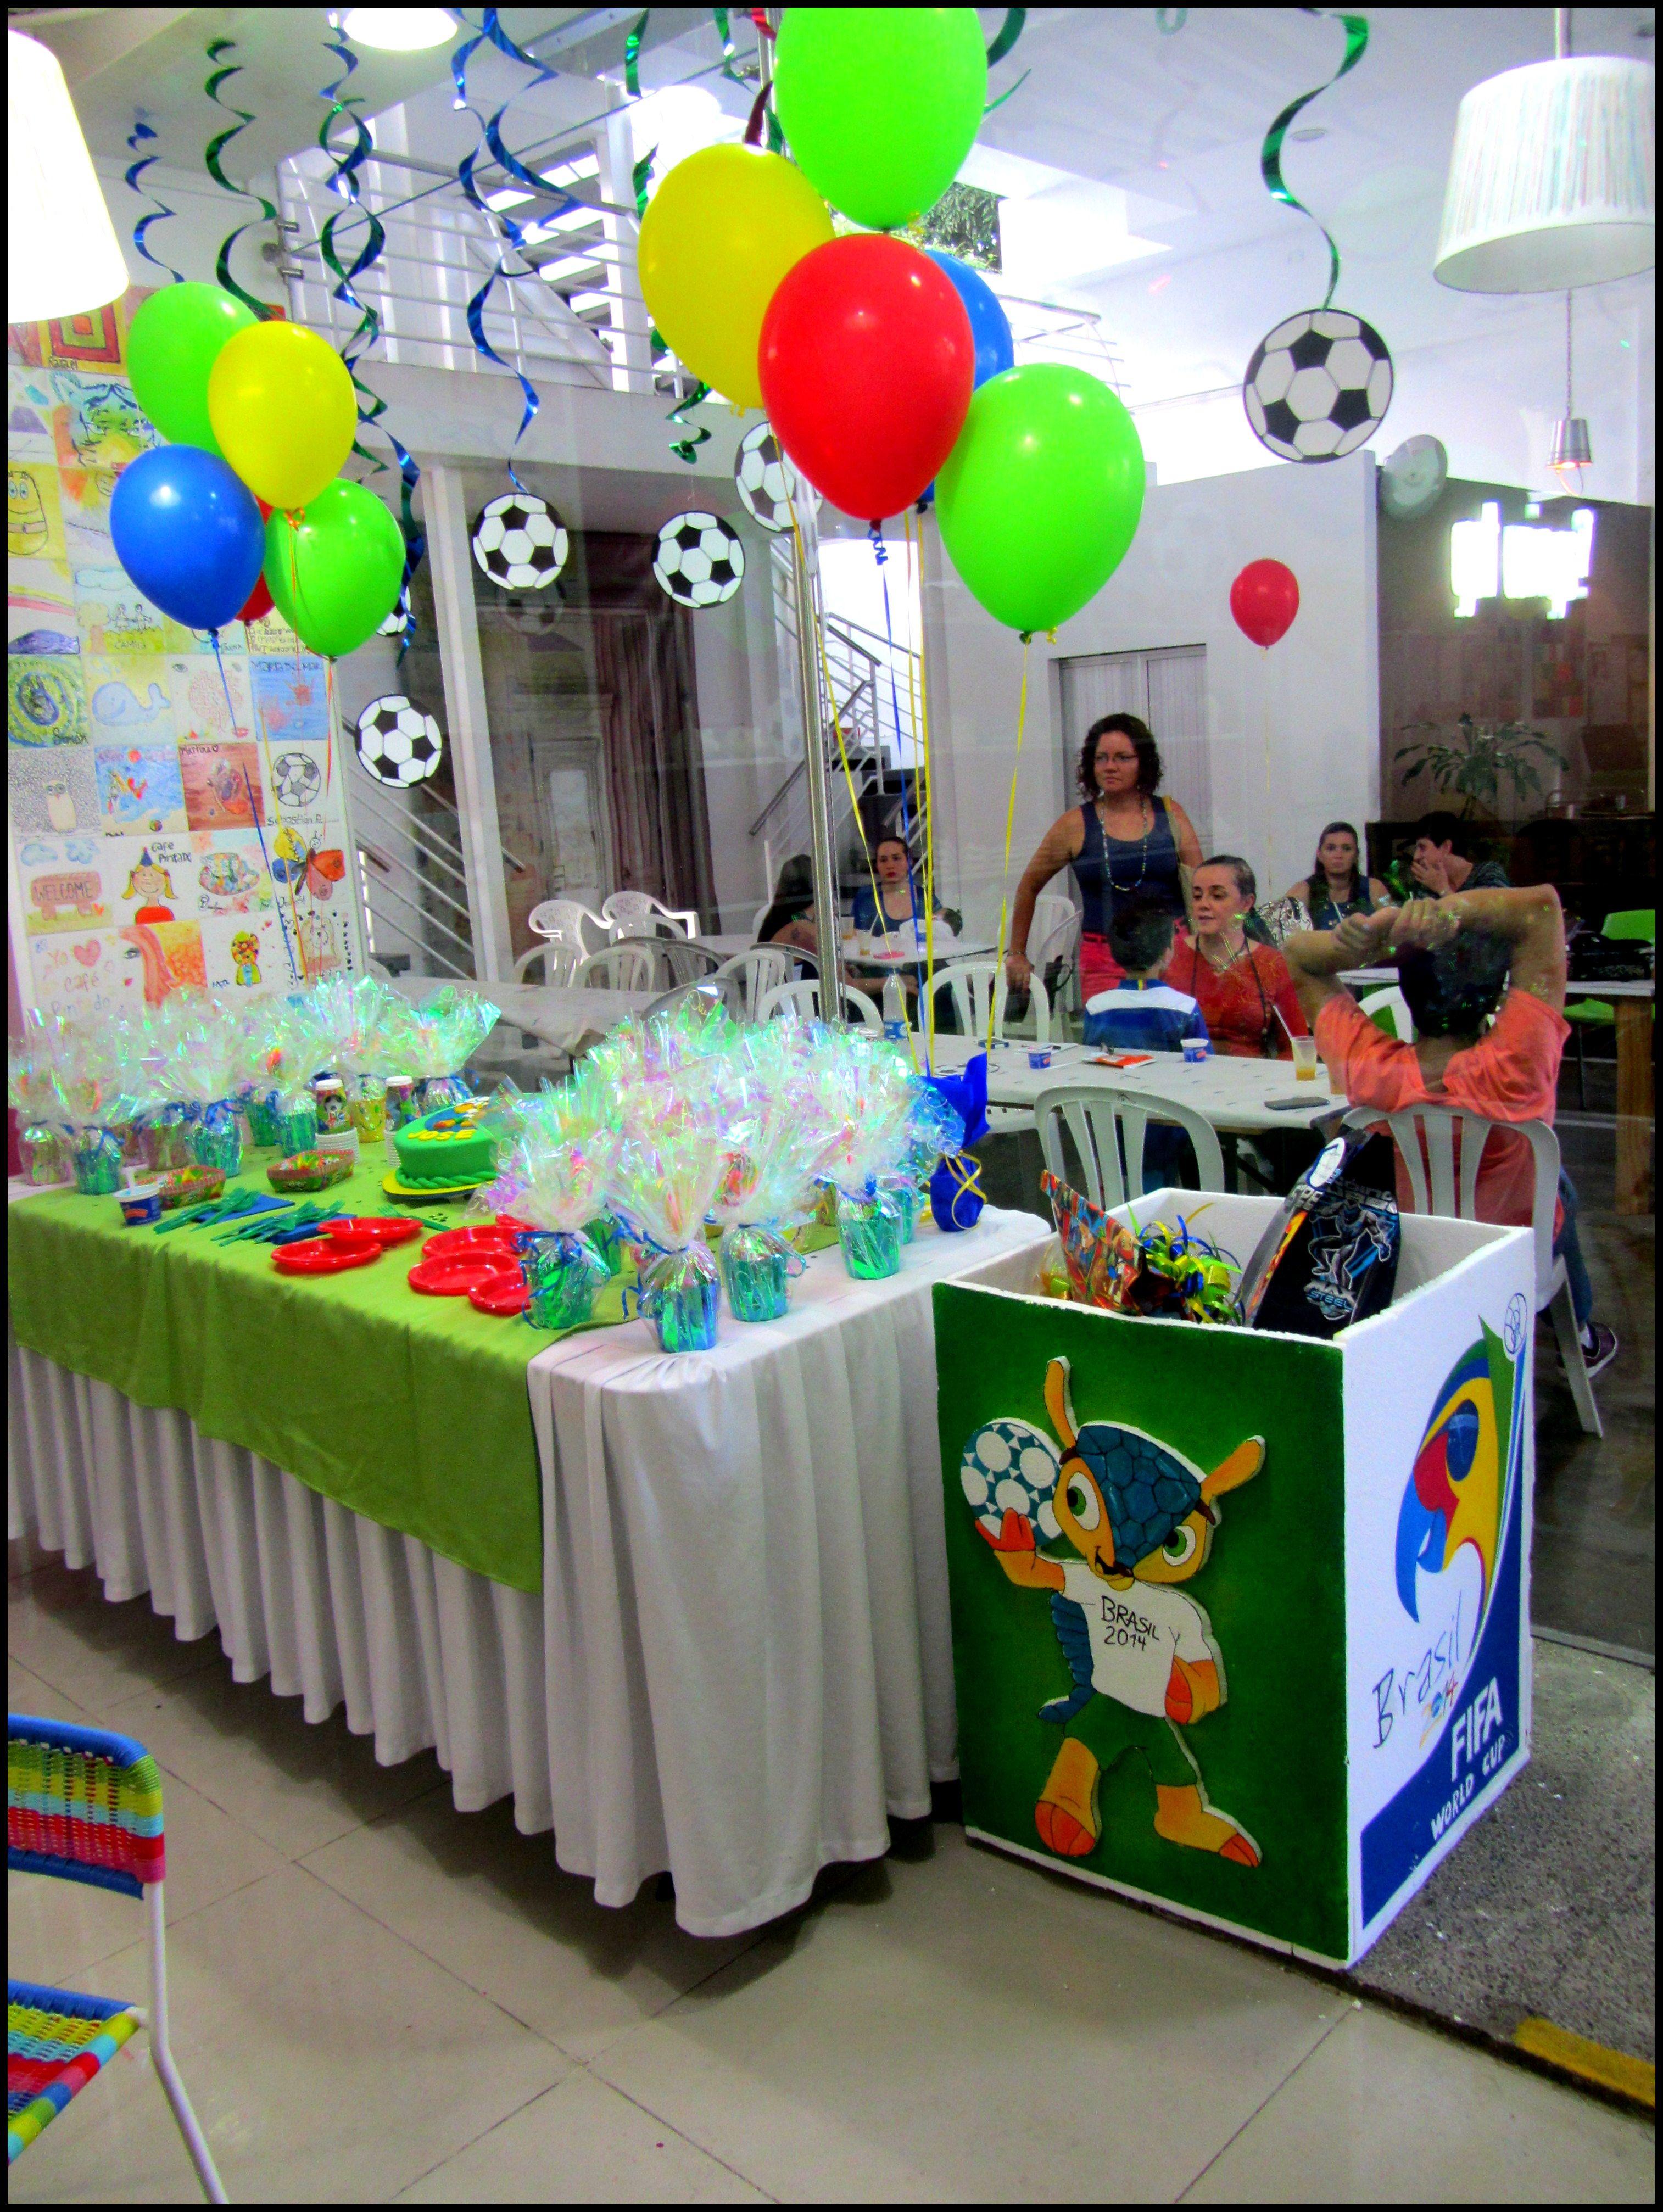 Mundial brasil 2014 party decoration decoraci n mundial for Ideas sobre decoracion